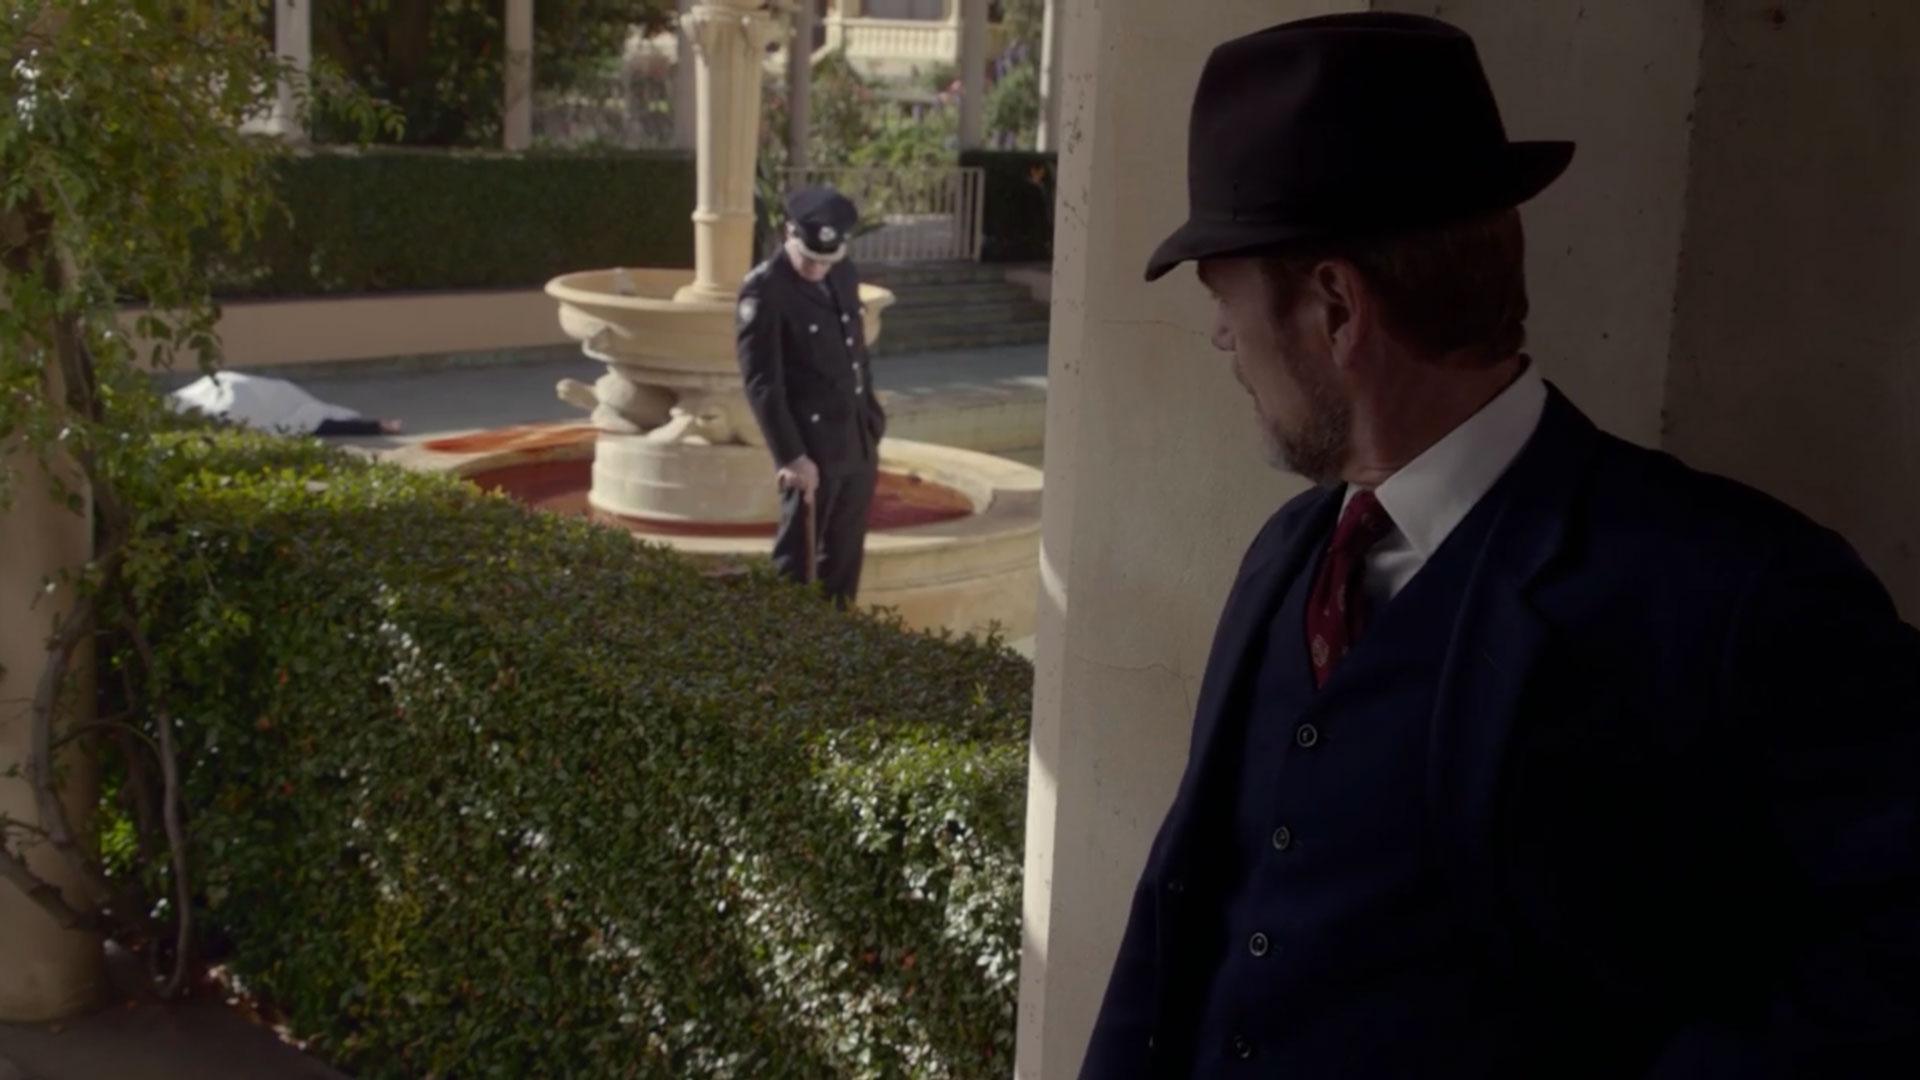 Dr. Blake investigates a murder despite being off the force.